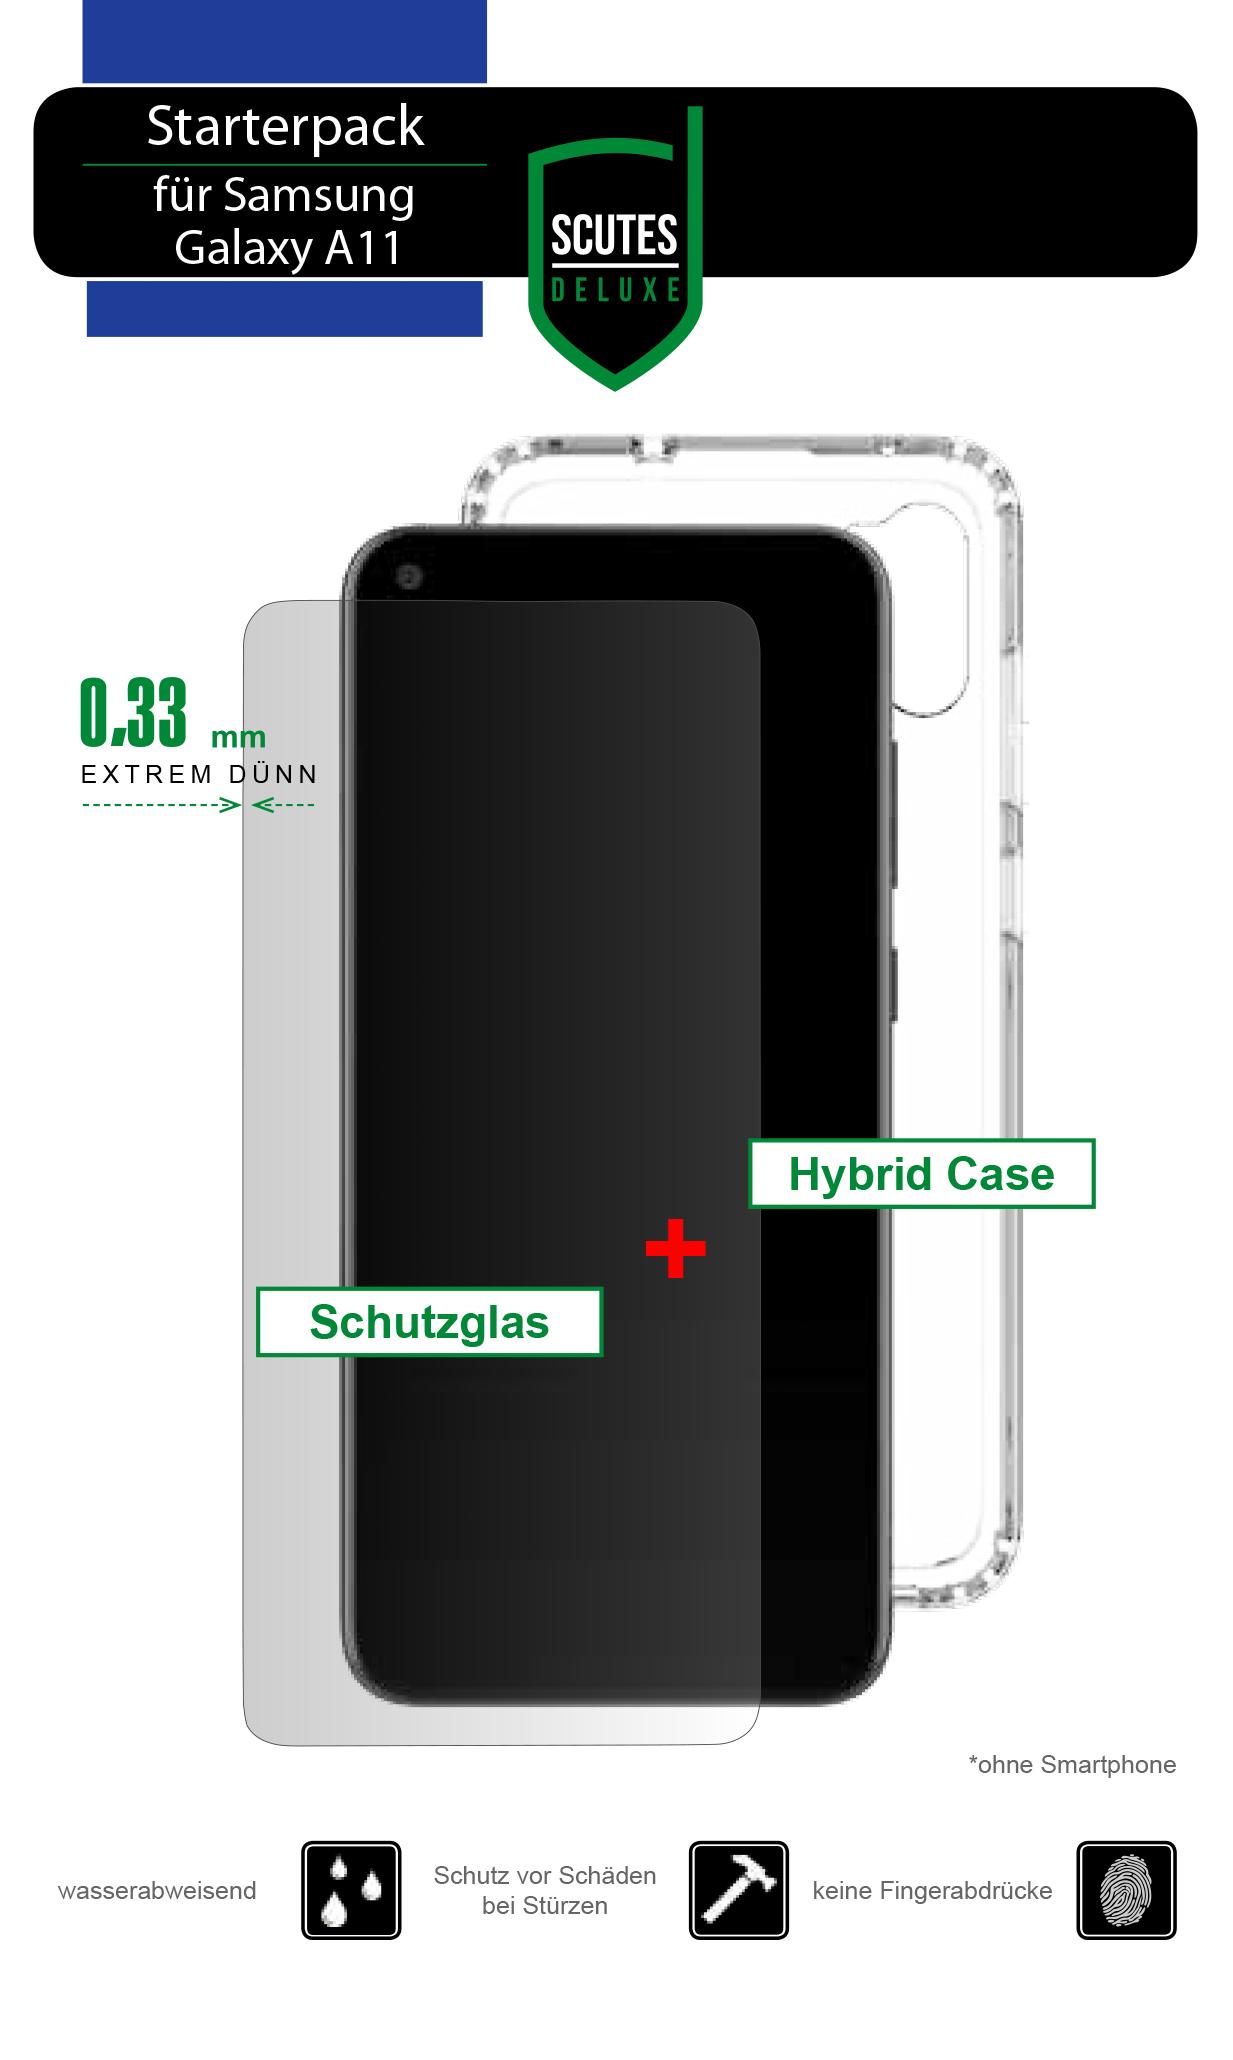 Starterpack (Samsung Galaxy A11)